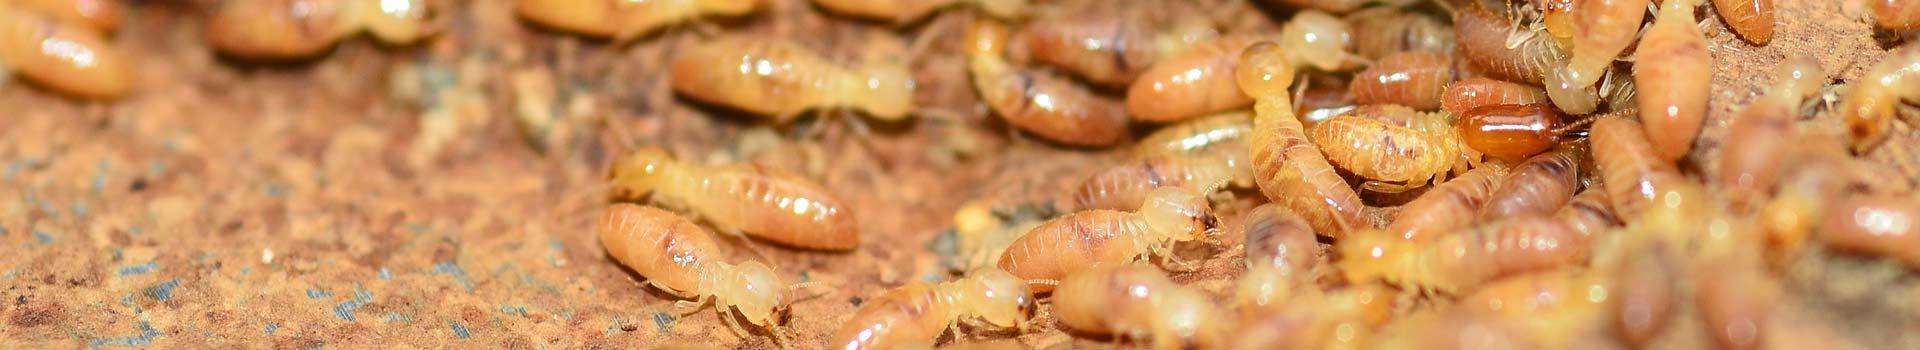 white-ants